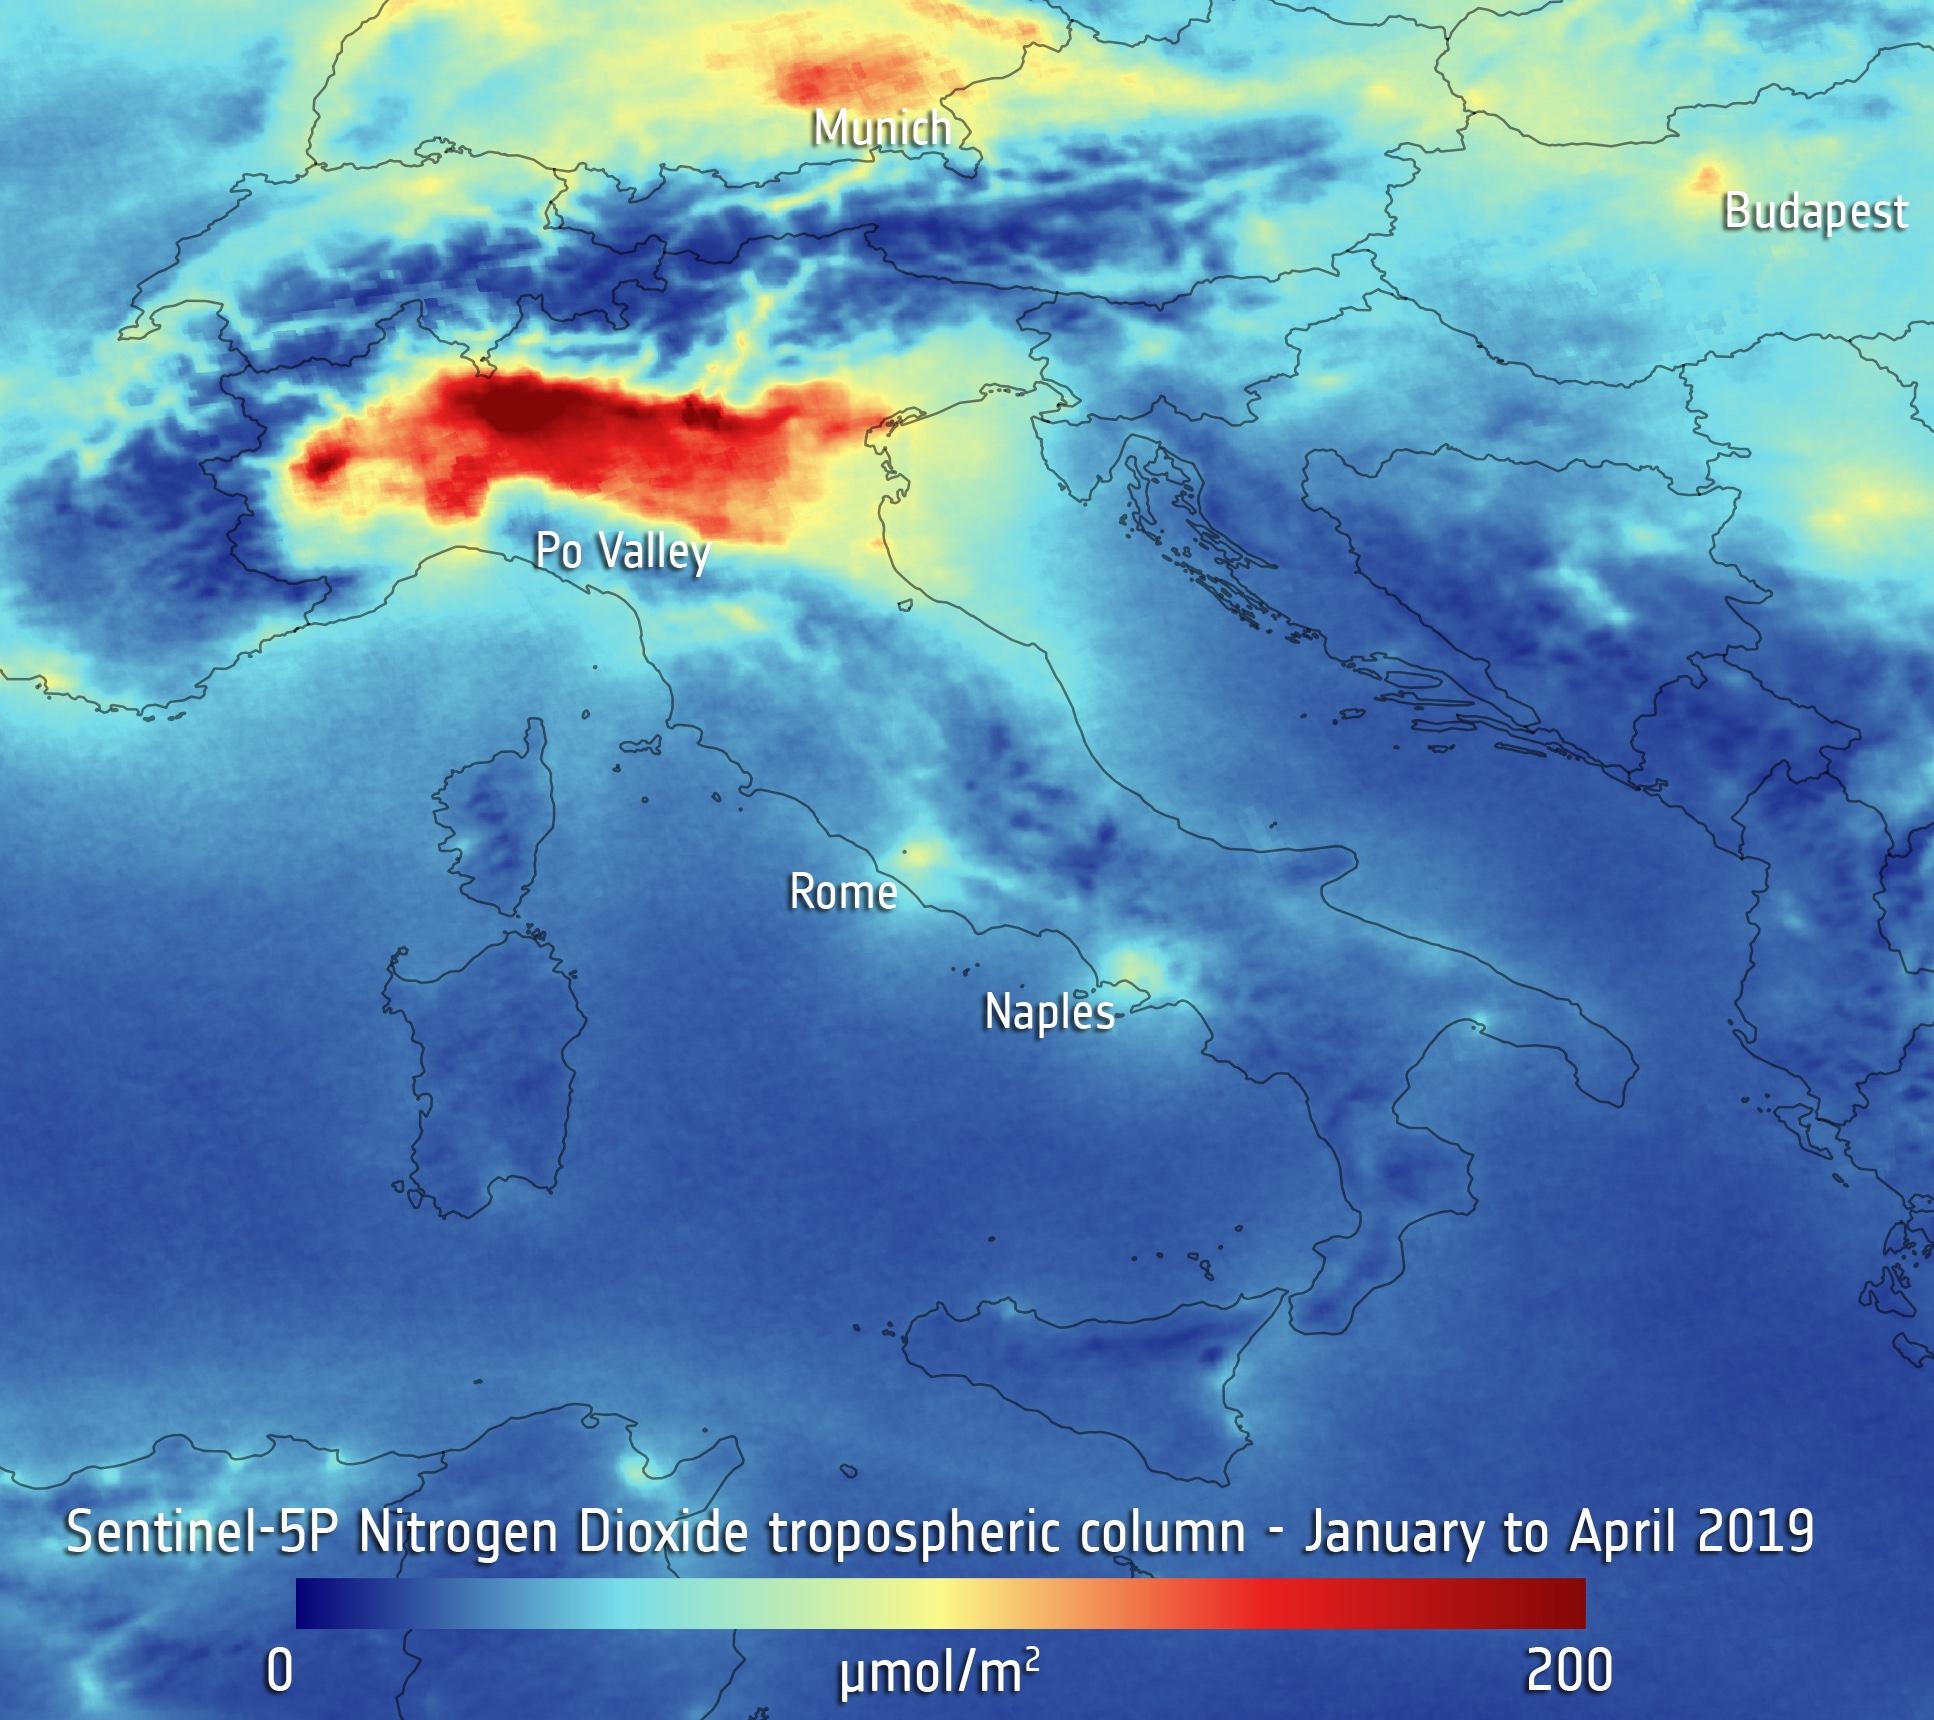 2020.04.30 Foto Pianura Padana smog 2019